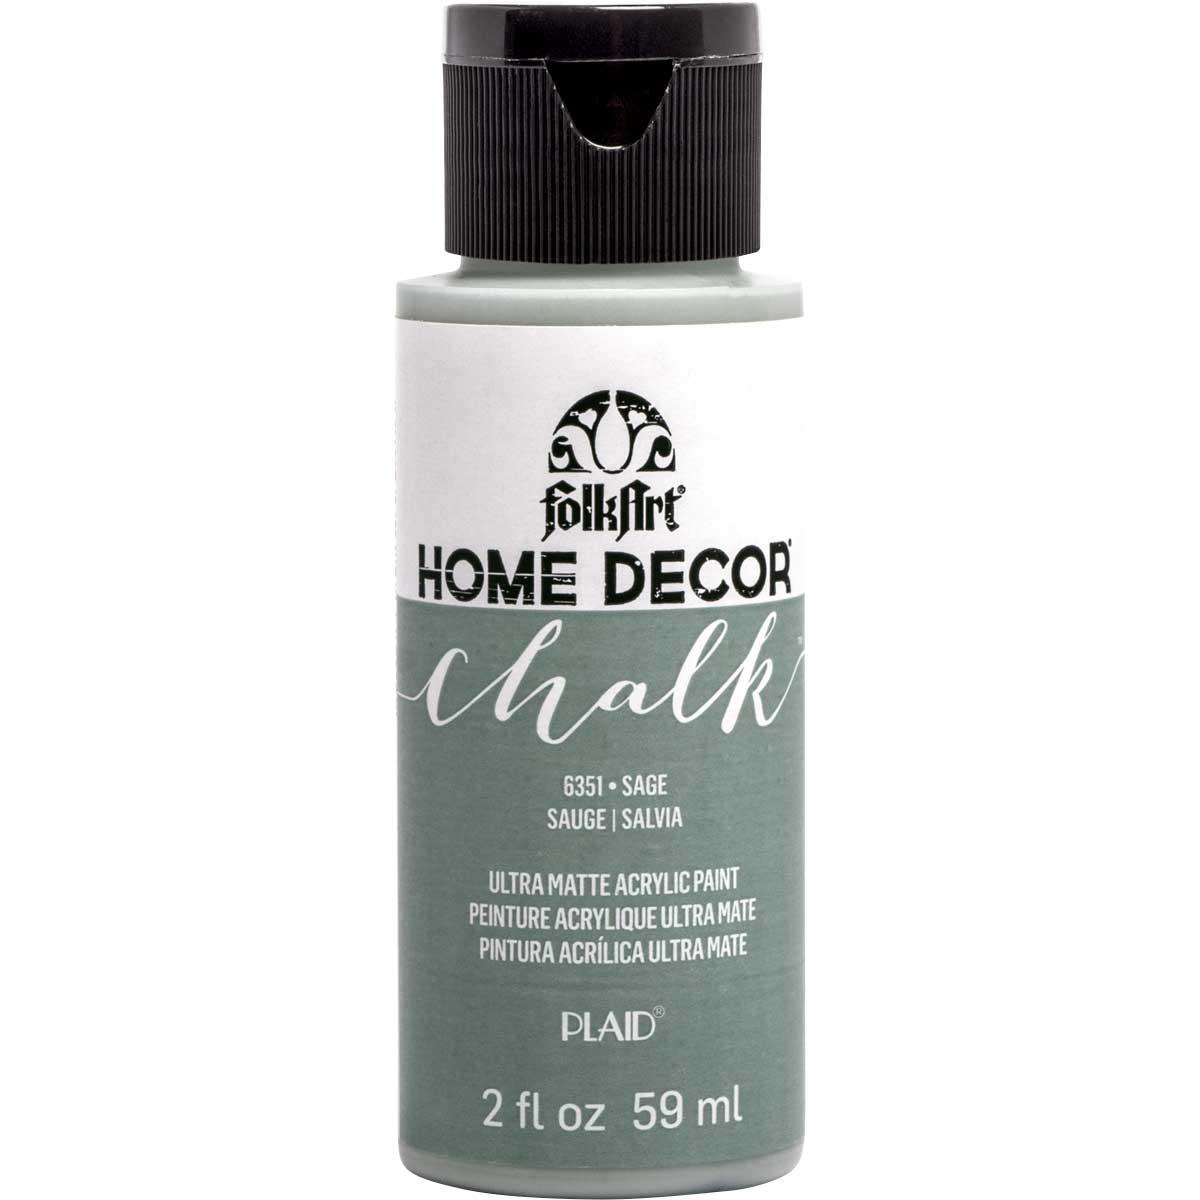 FolkArt ® Home Decor™ Chalk - Sage, 2 oz. - 6351